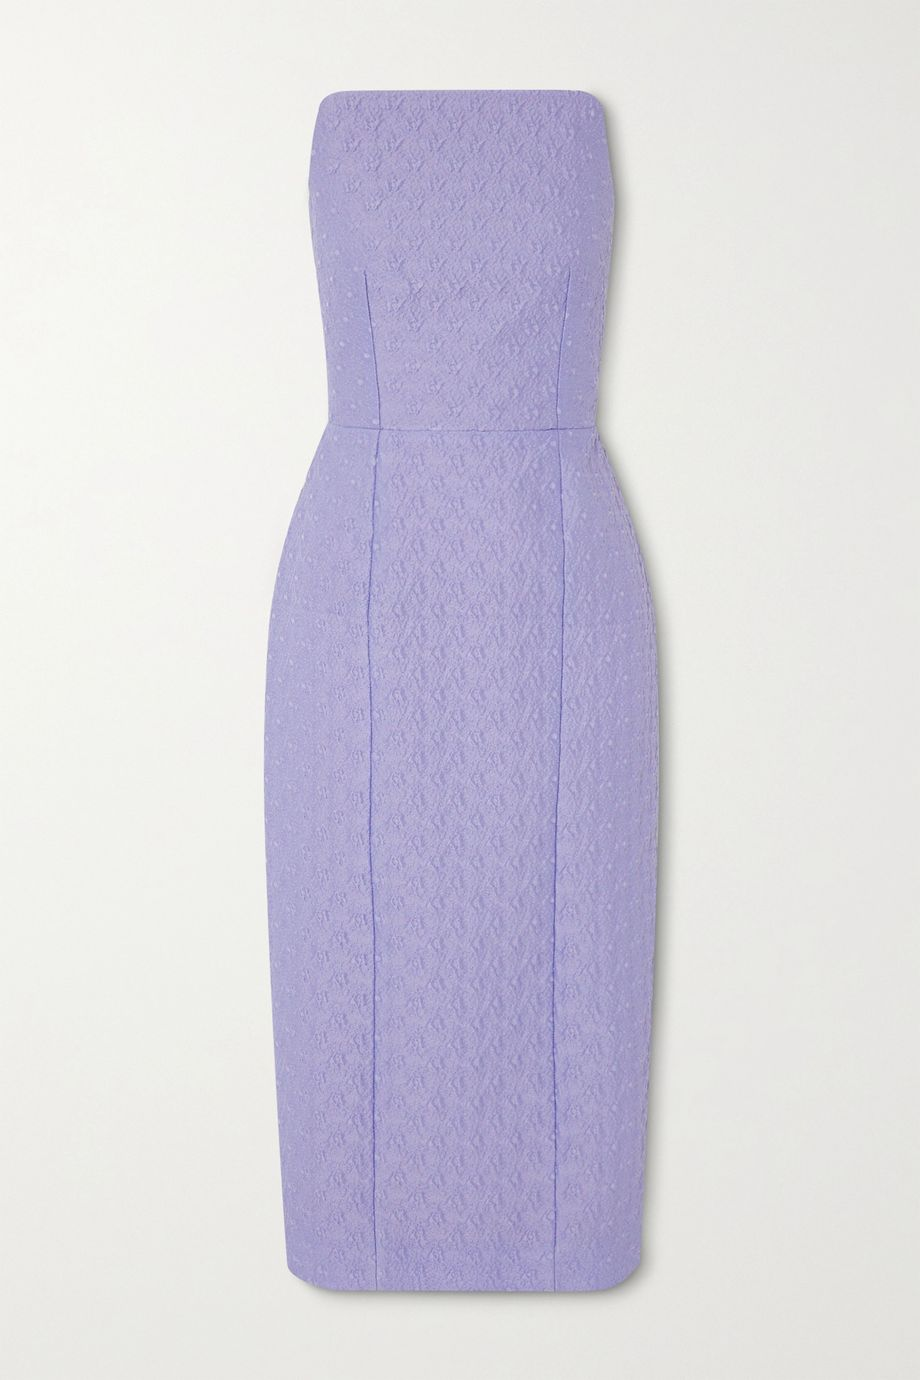 Emilia Wickstead Novia strapless jacquard midi dress